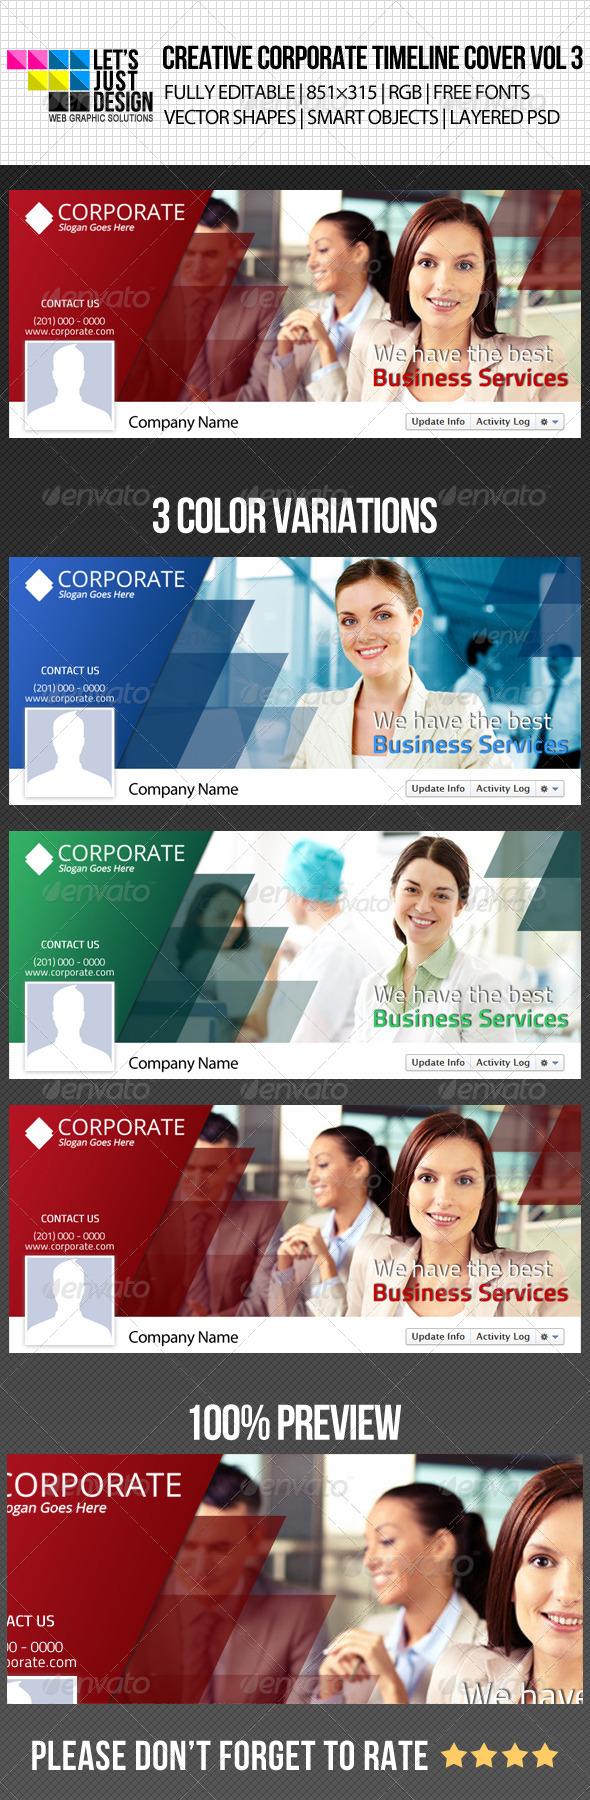 Creative Corporate Facebook Timeline Cover Vol 3 - Facebook Timeline Covers Social Media